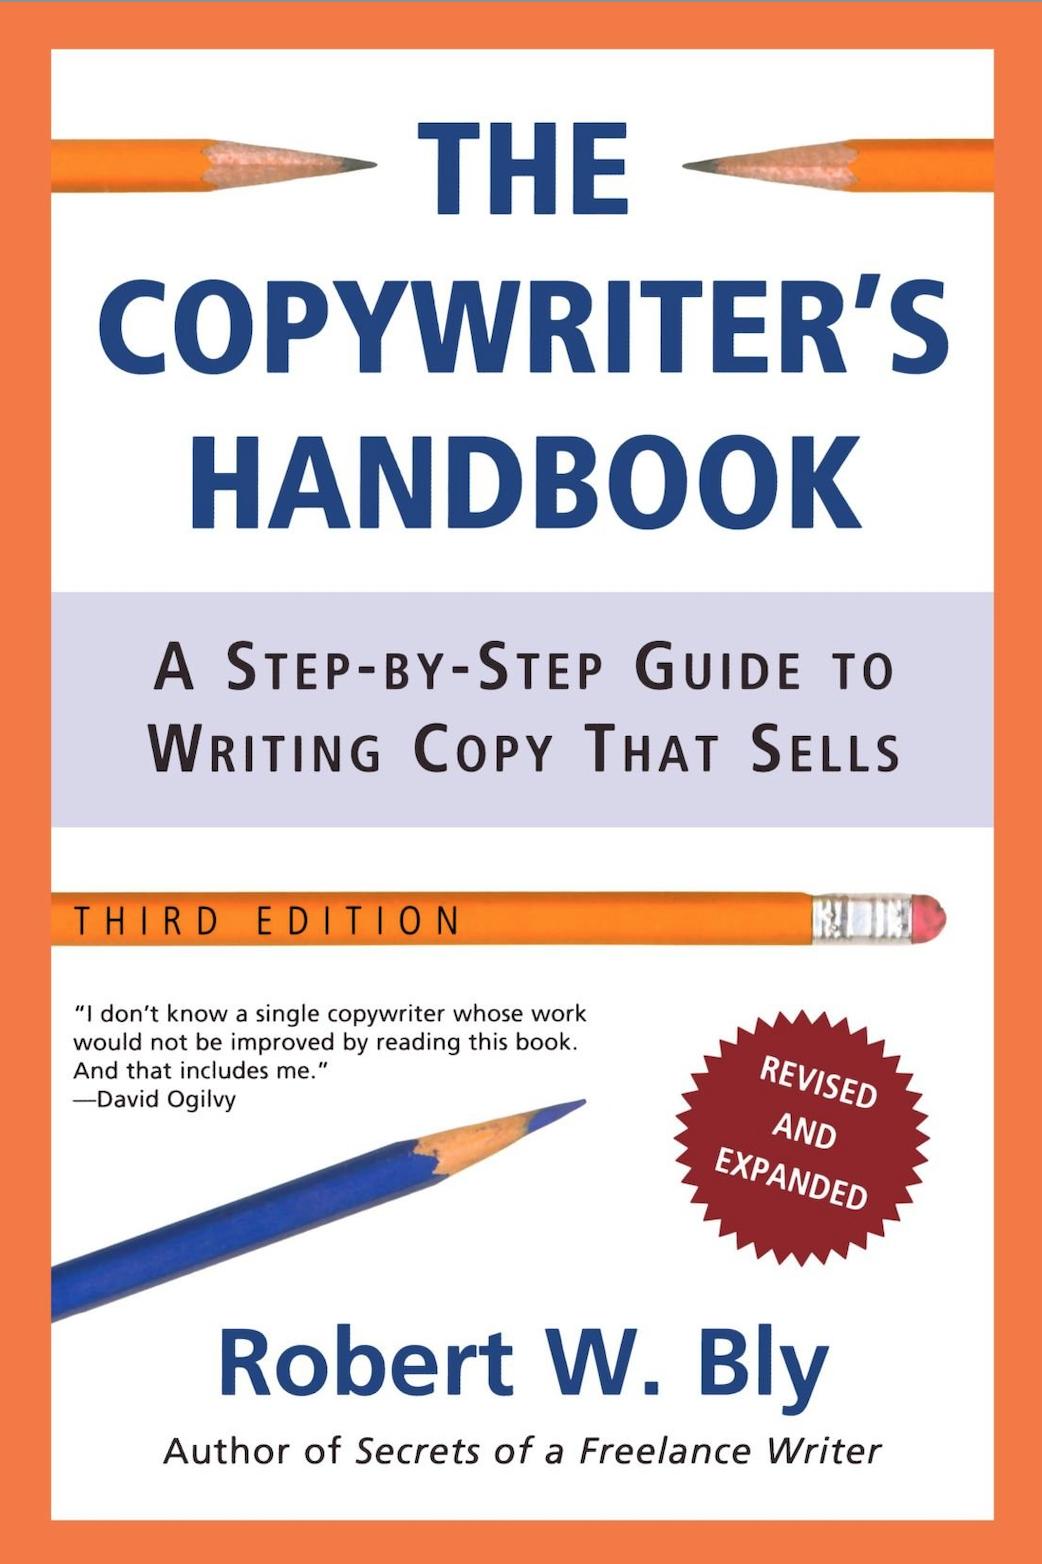 The Copywriter's Handbook